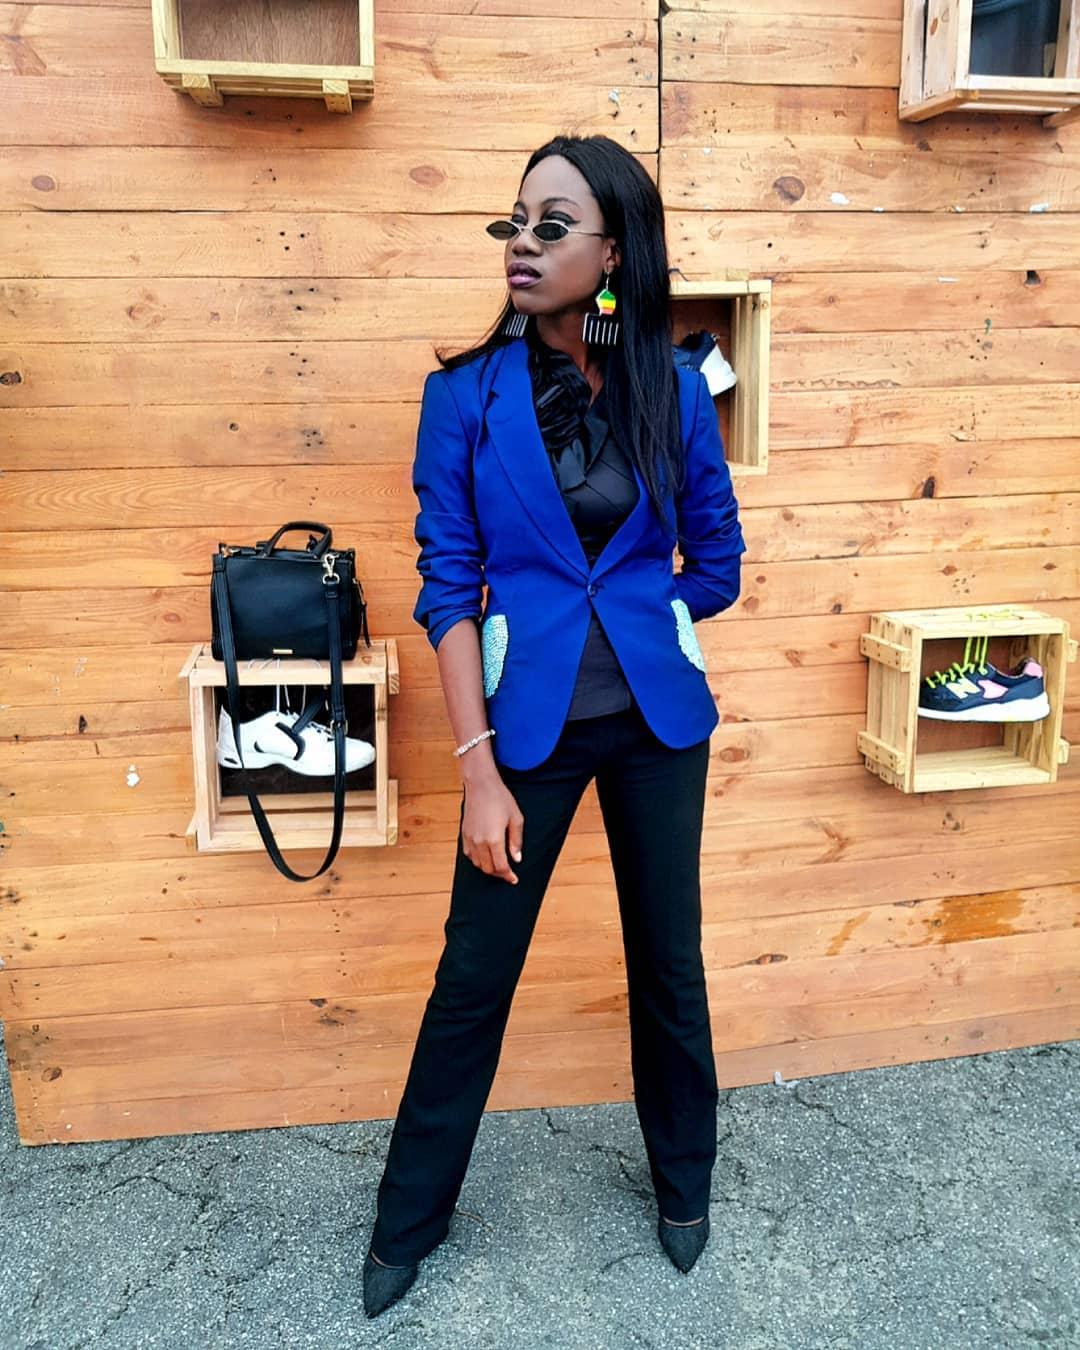 Amazing Styles That Rocked The Heineken Lagos Fashion Week 2019